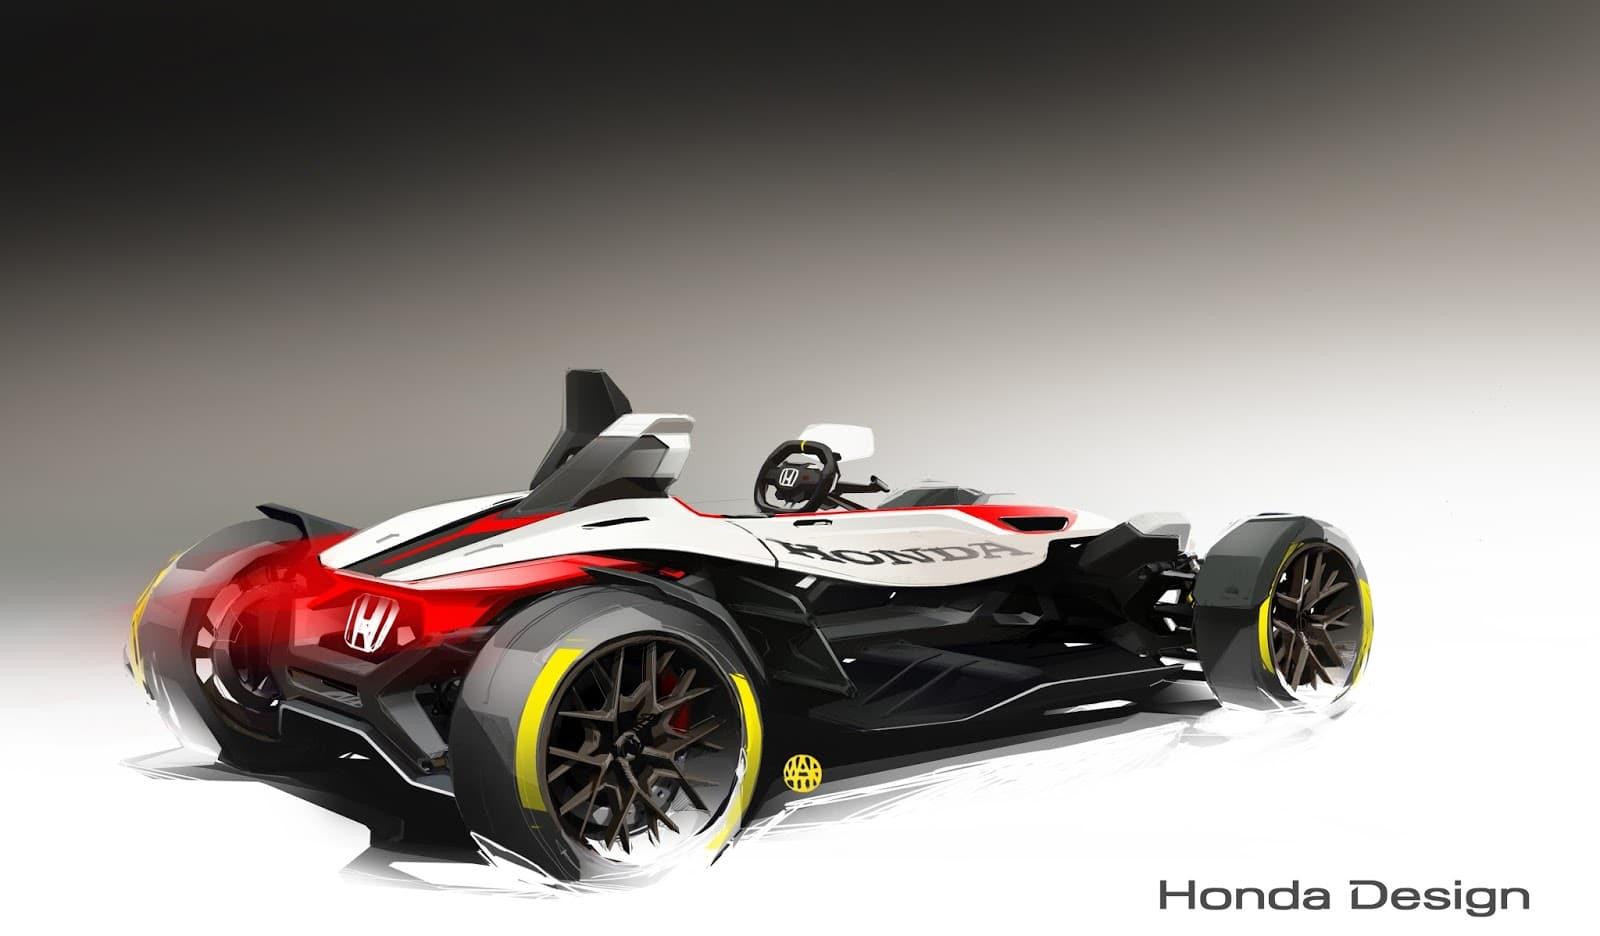 60617 HONDA PROJECT 2 4 POWERED BY RC213V Αυτοκίνητο ή μοτοσικλέτα; Και τα δυο σε ένα μας λέει η Honda Frankfurt Motor Show, Global Design Project, Honda, Honda design, Honda Project 2&4